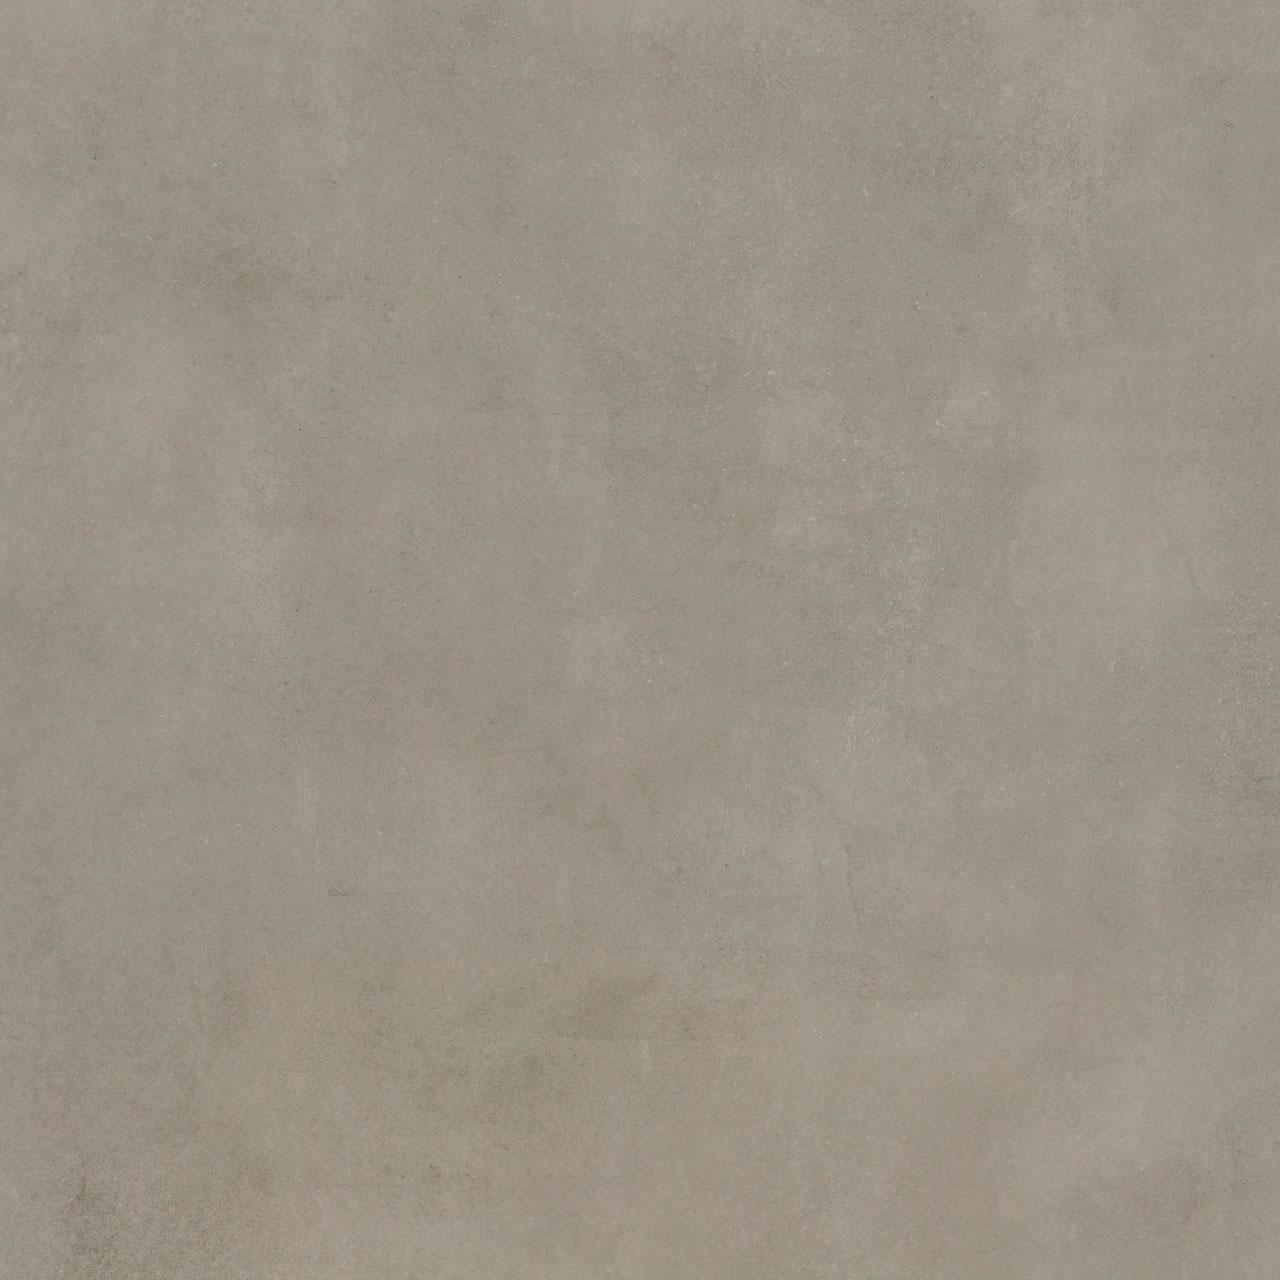 munari concreto ac 59×59